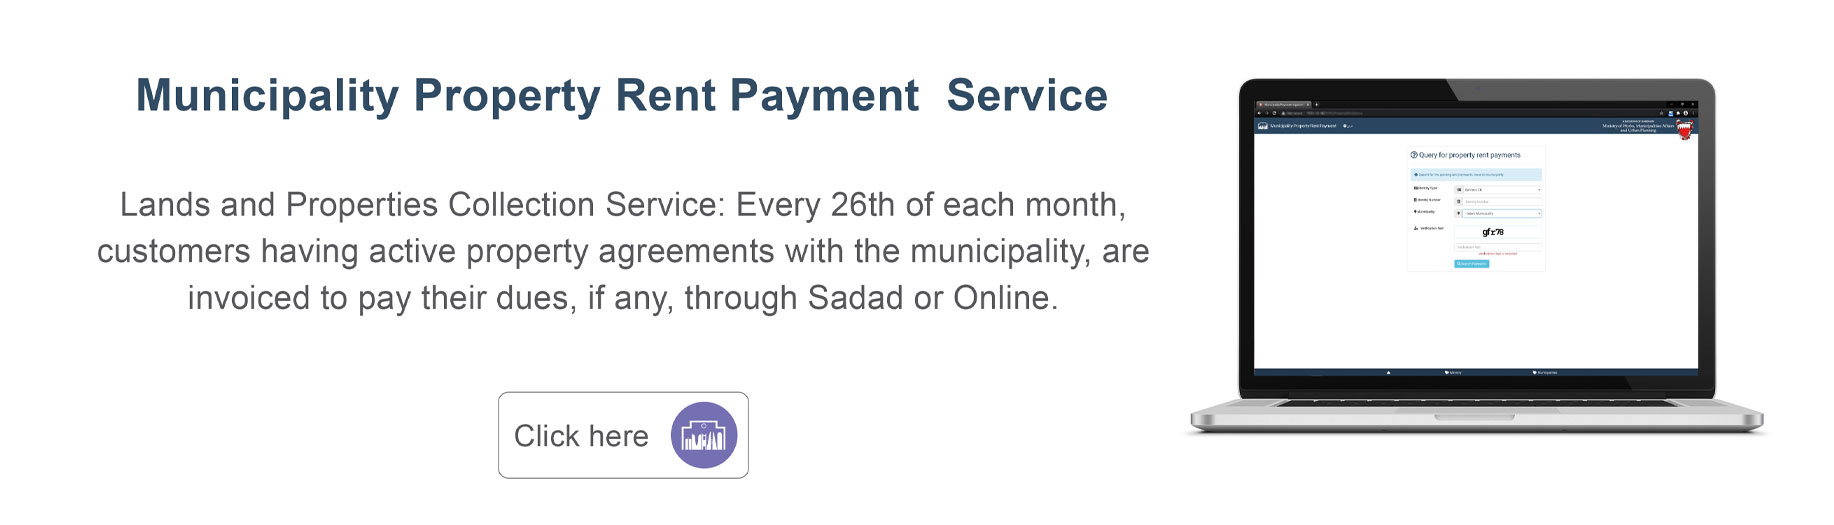 Municipality Property Rent Payment  Service